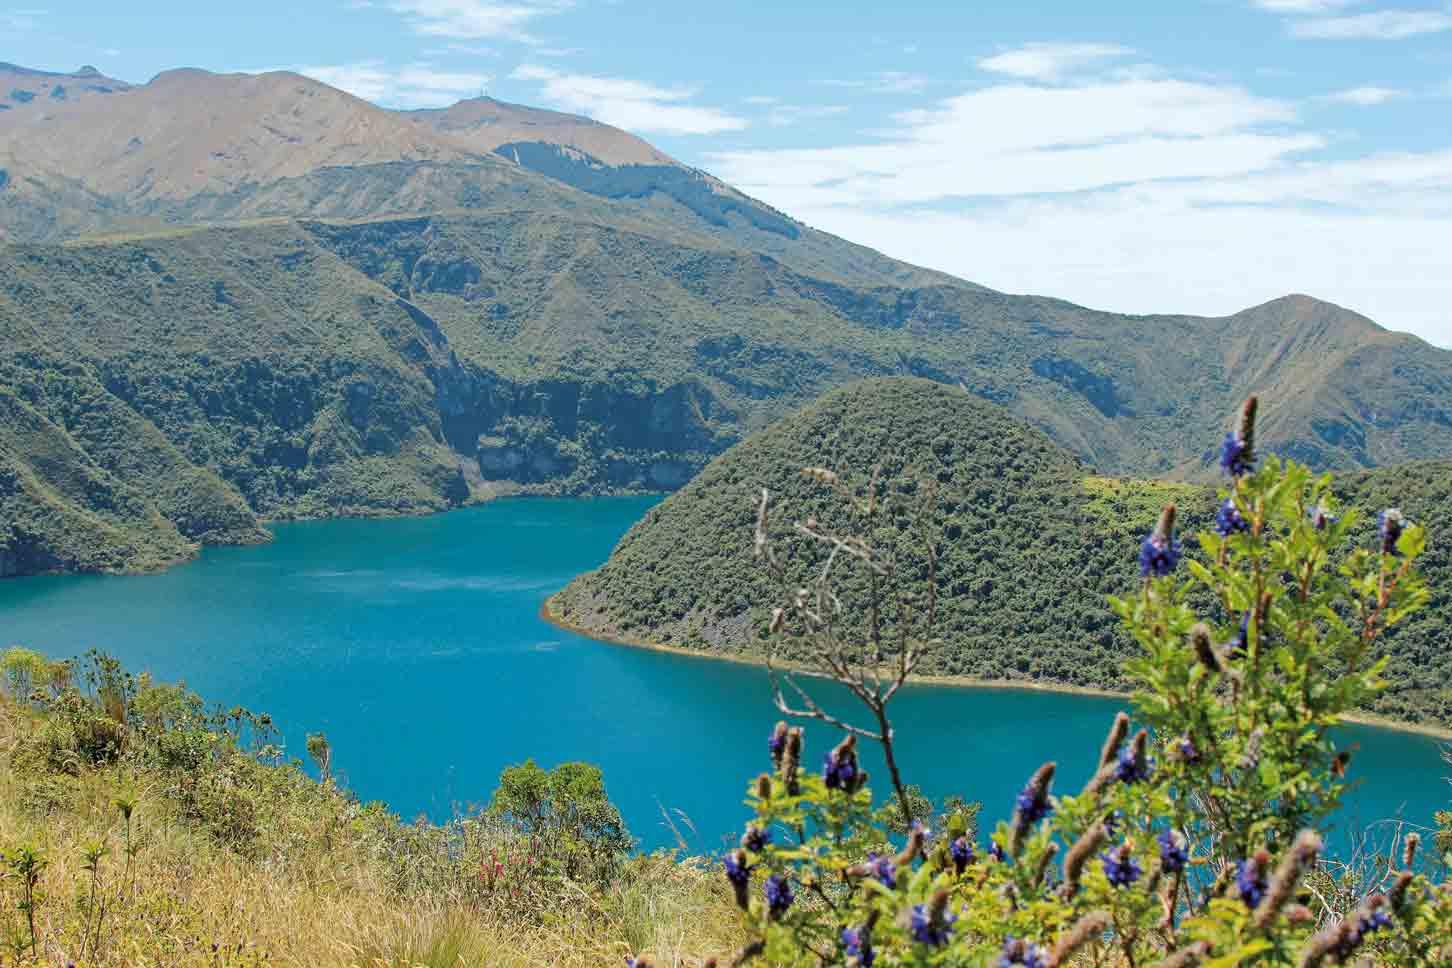 Wanderung am Cuicocha-Kratersee, Ecuador